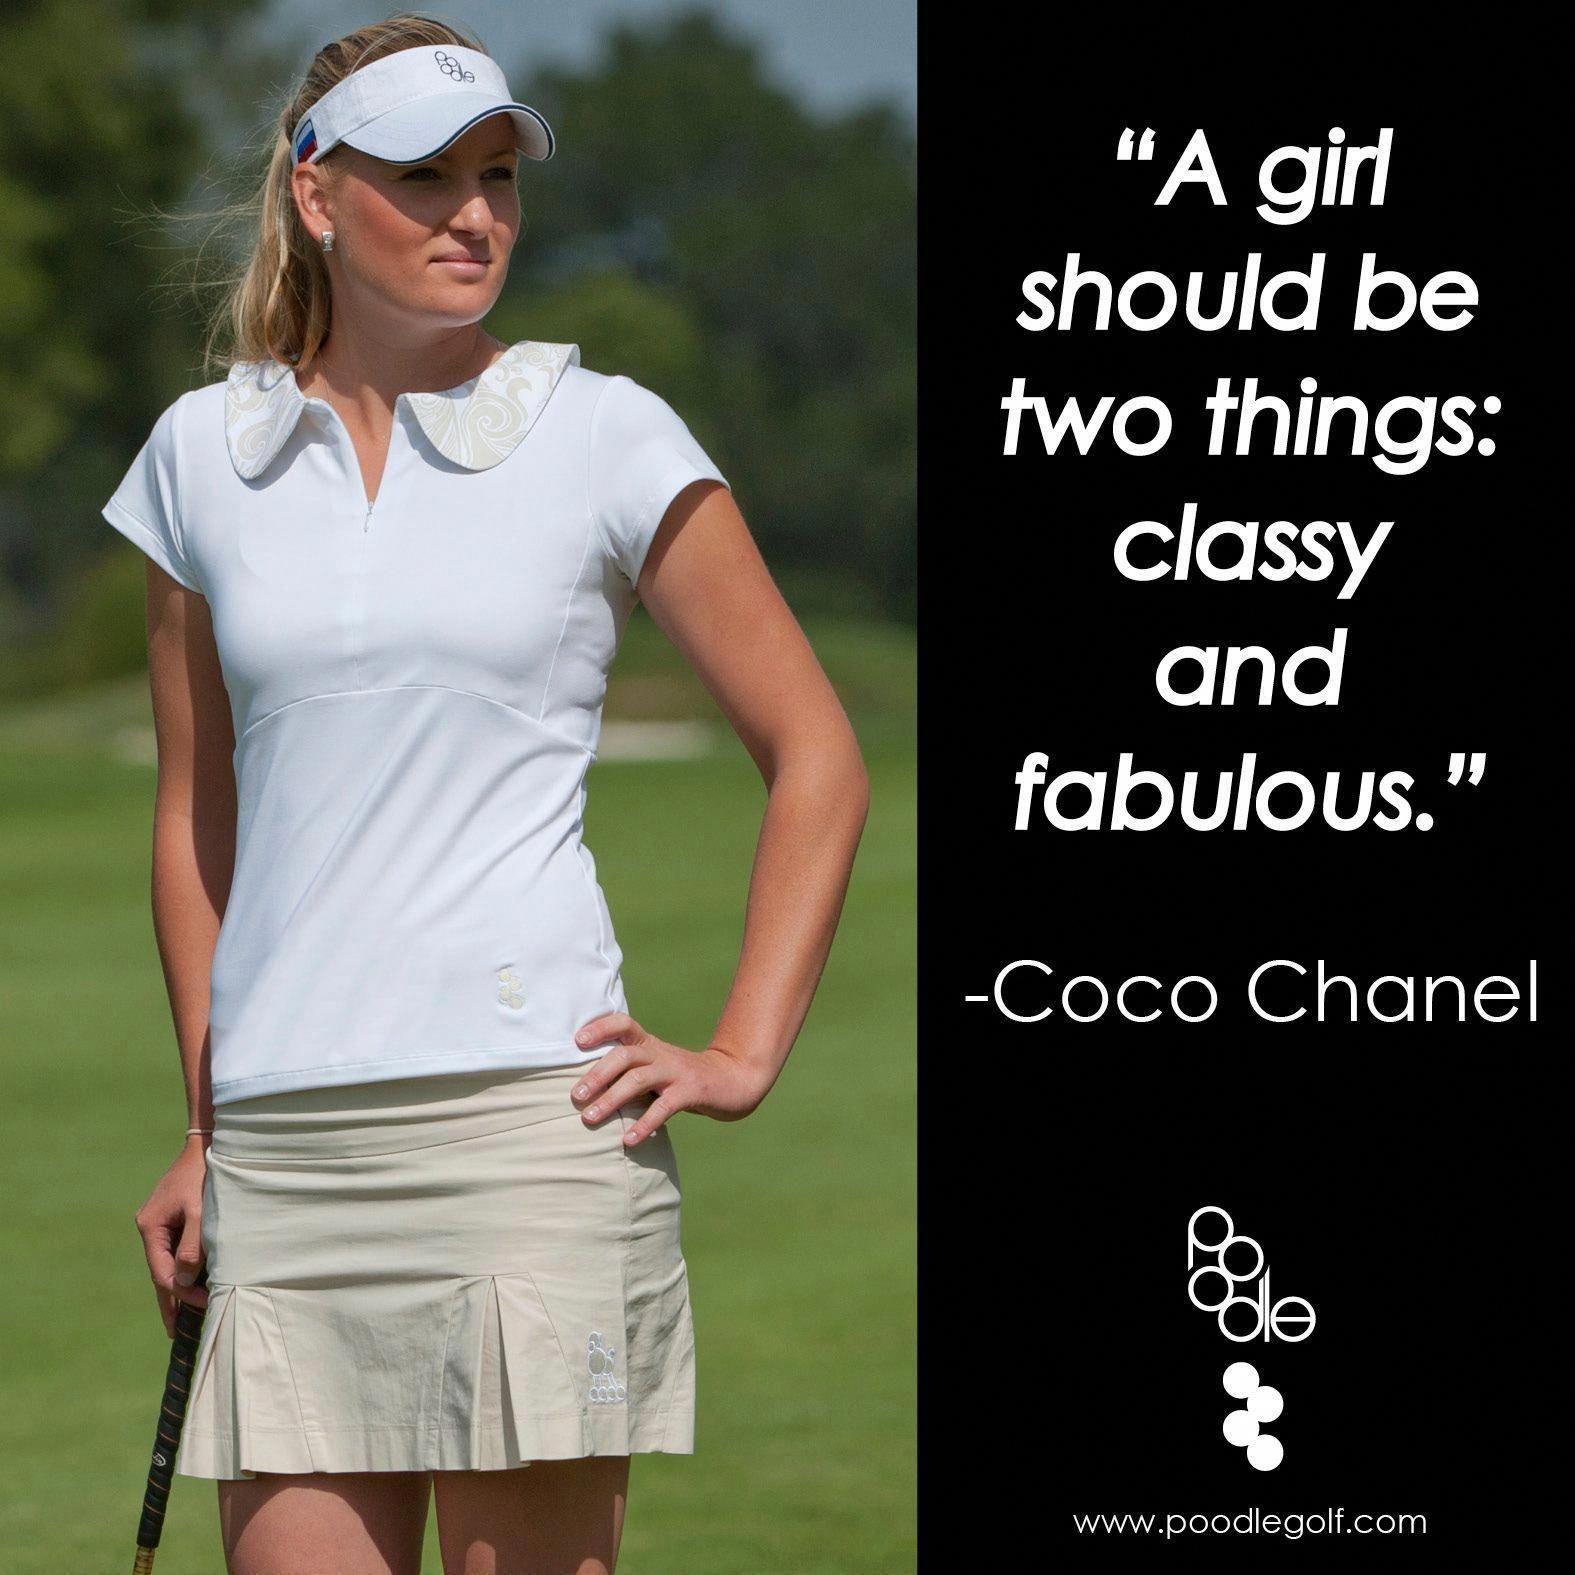 Golf Humor Free Download Golf Wit Oo Golfzing Tee Times Golf Humor Zyra Golf Zbraslav Golf Zurich Classic Golf Zach Jo Golf Humor Golf Quotes Golf Inspiration